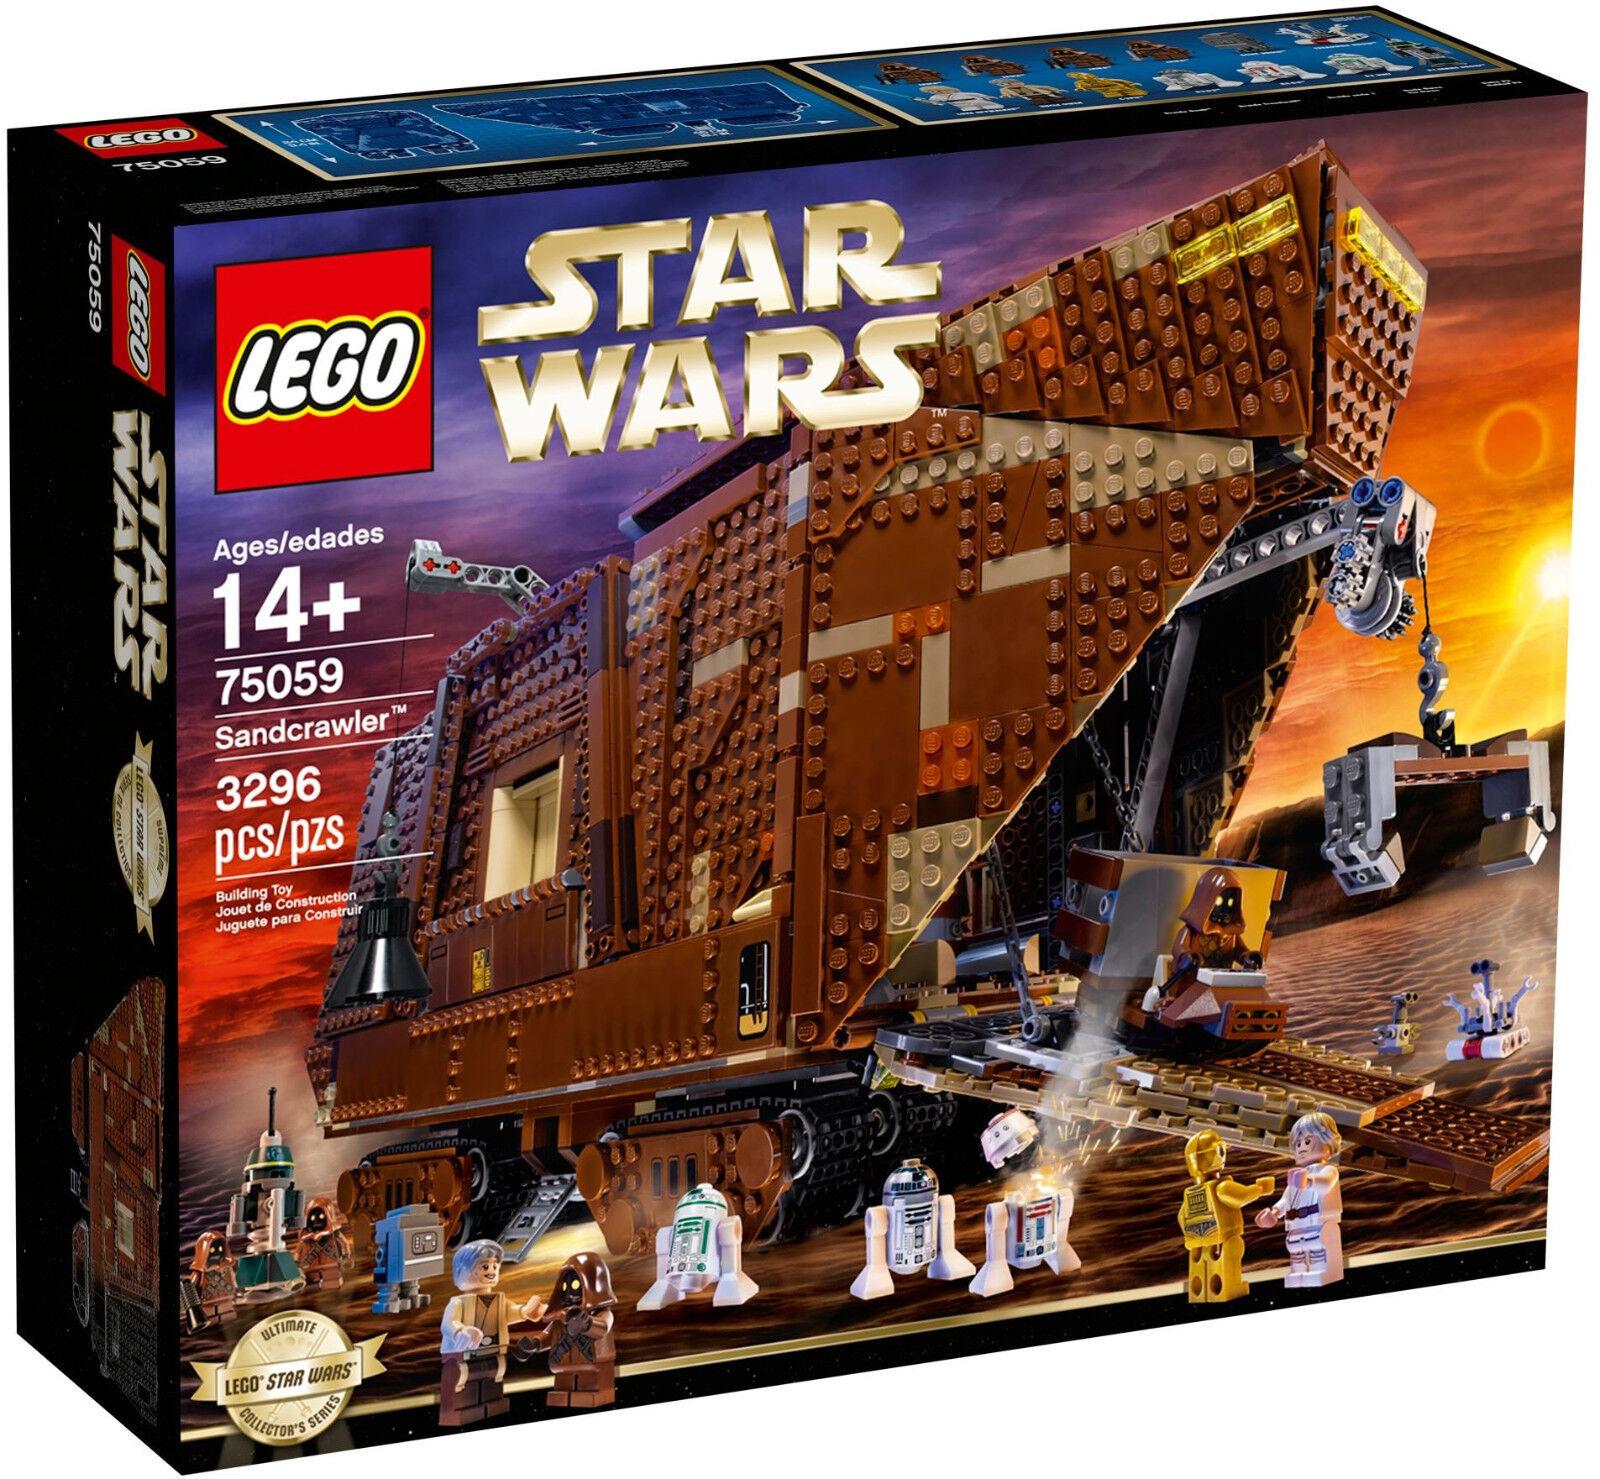 LEGO Star Wars-in esclusiva 75059 Sandcrawler M. r5-d8, Owen Lars & JAWA-NUOVO OVP